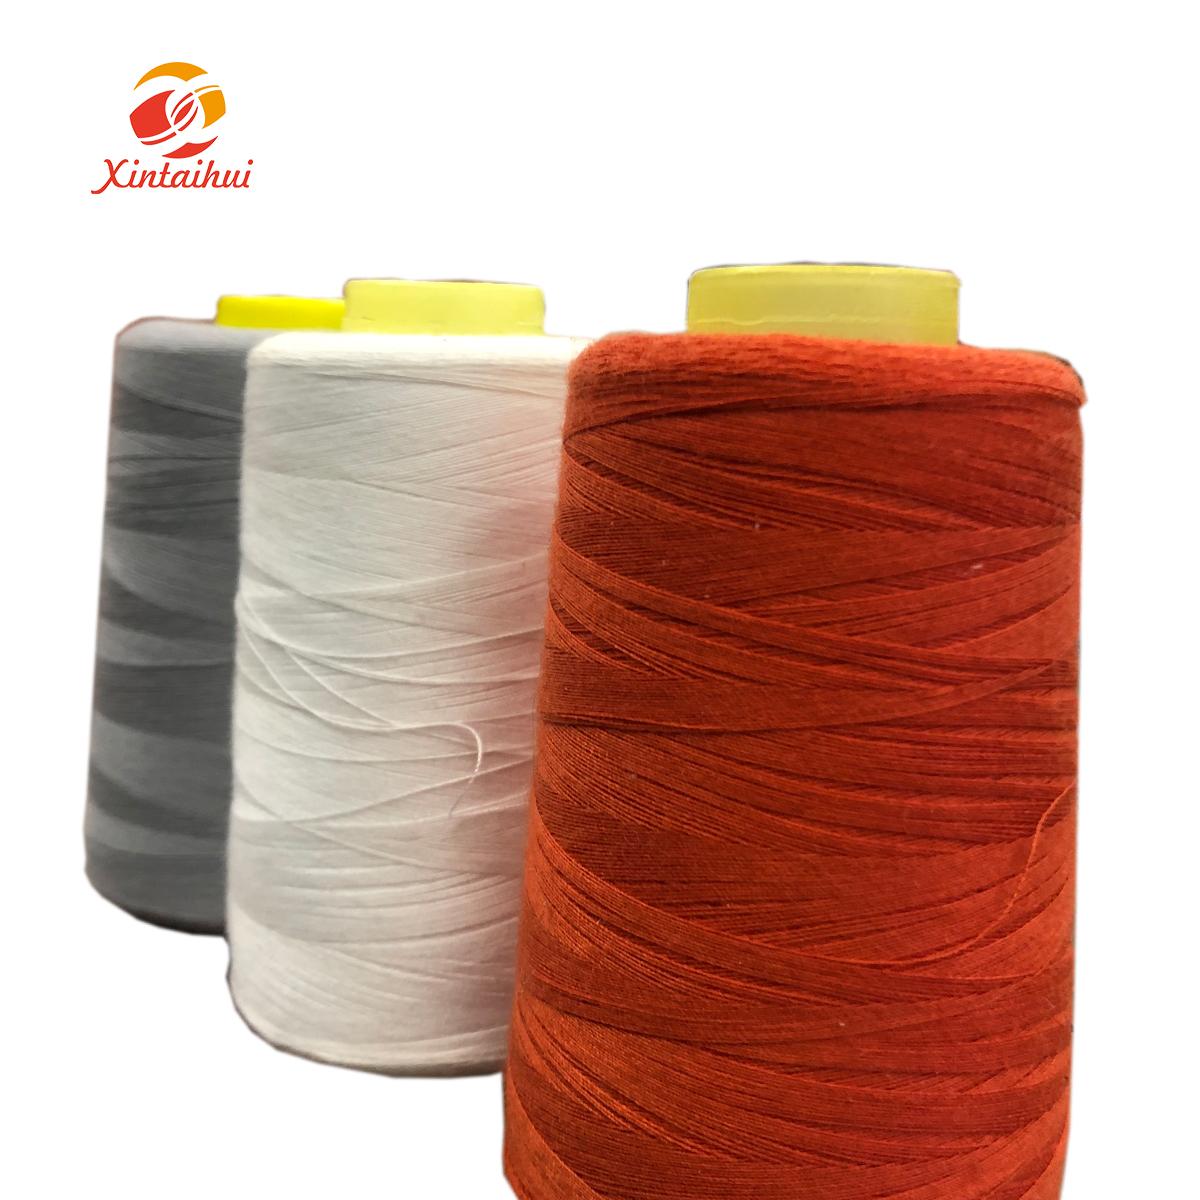 40//2 Spool 10 colour 100/% Cotton Thread Reel Machine Overlock Hand Sewing Thread